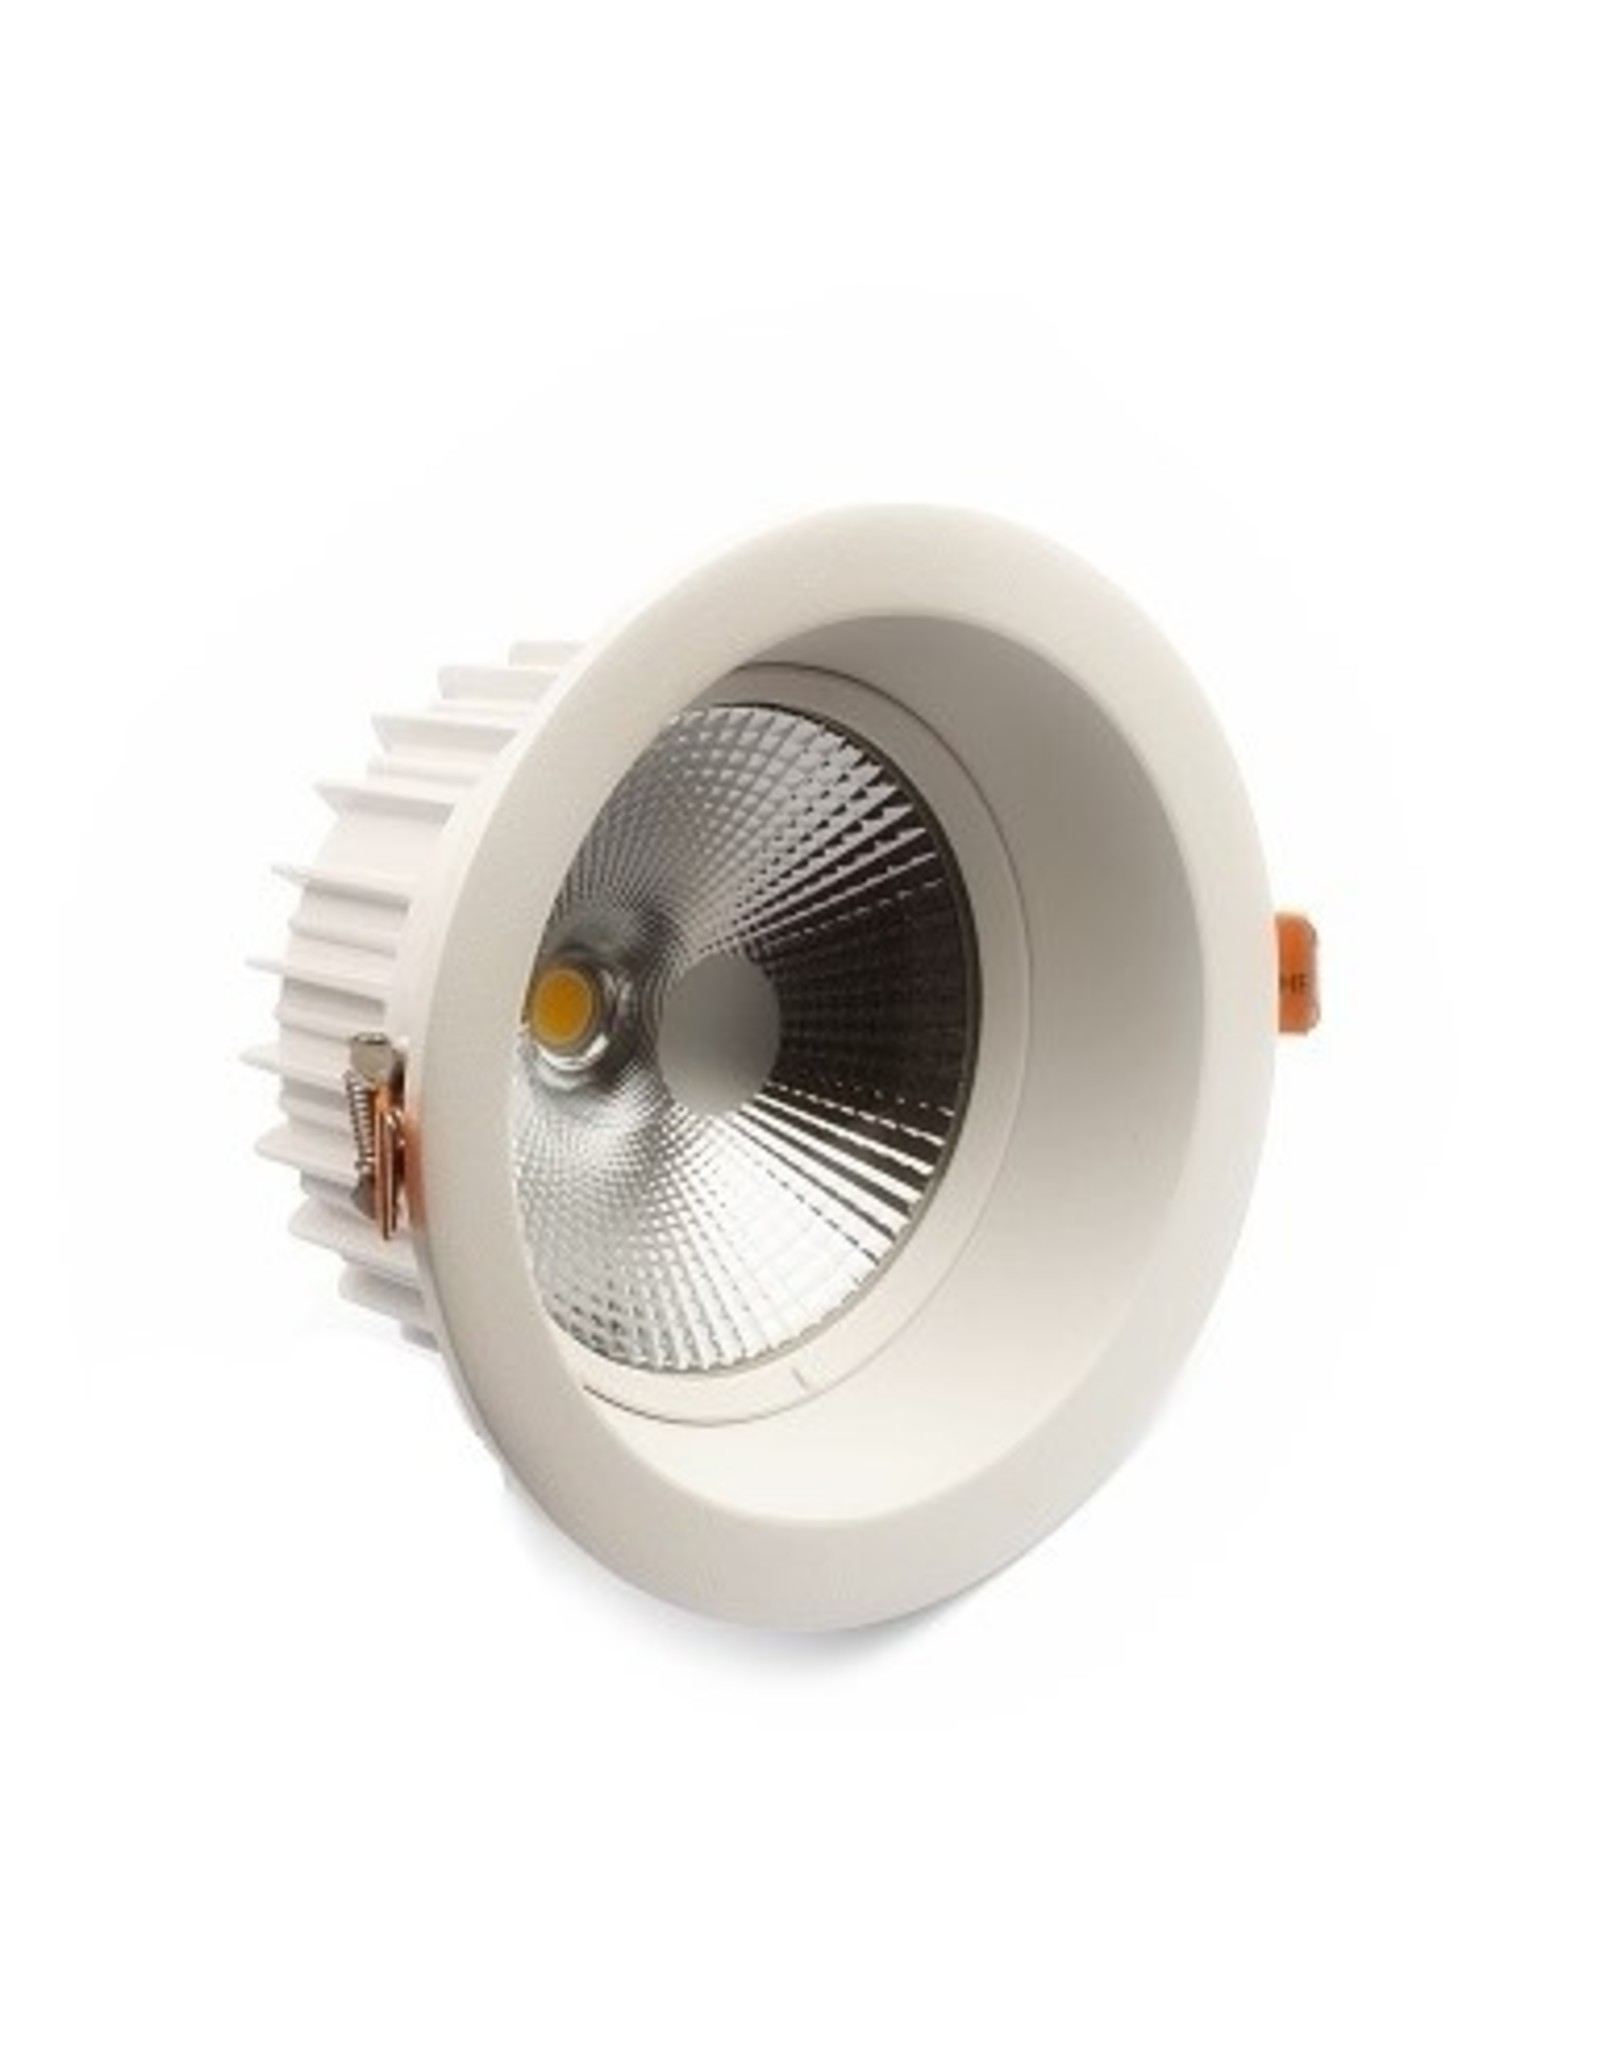 LedLed Glare Dowlight 4000k 145mm 8-12W gatmaat 125mm